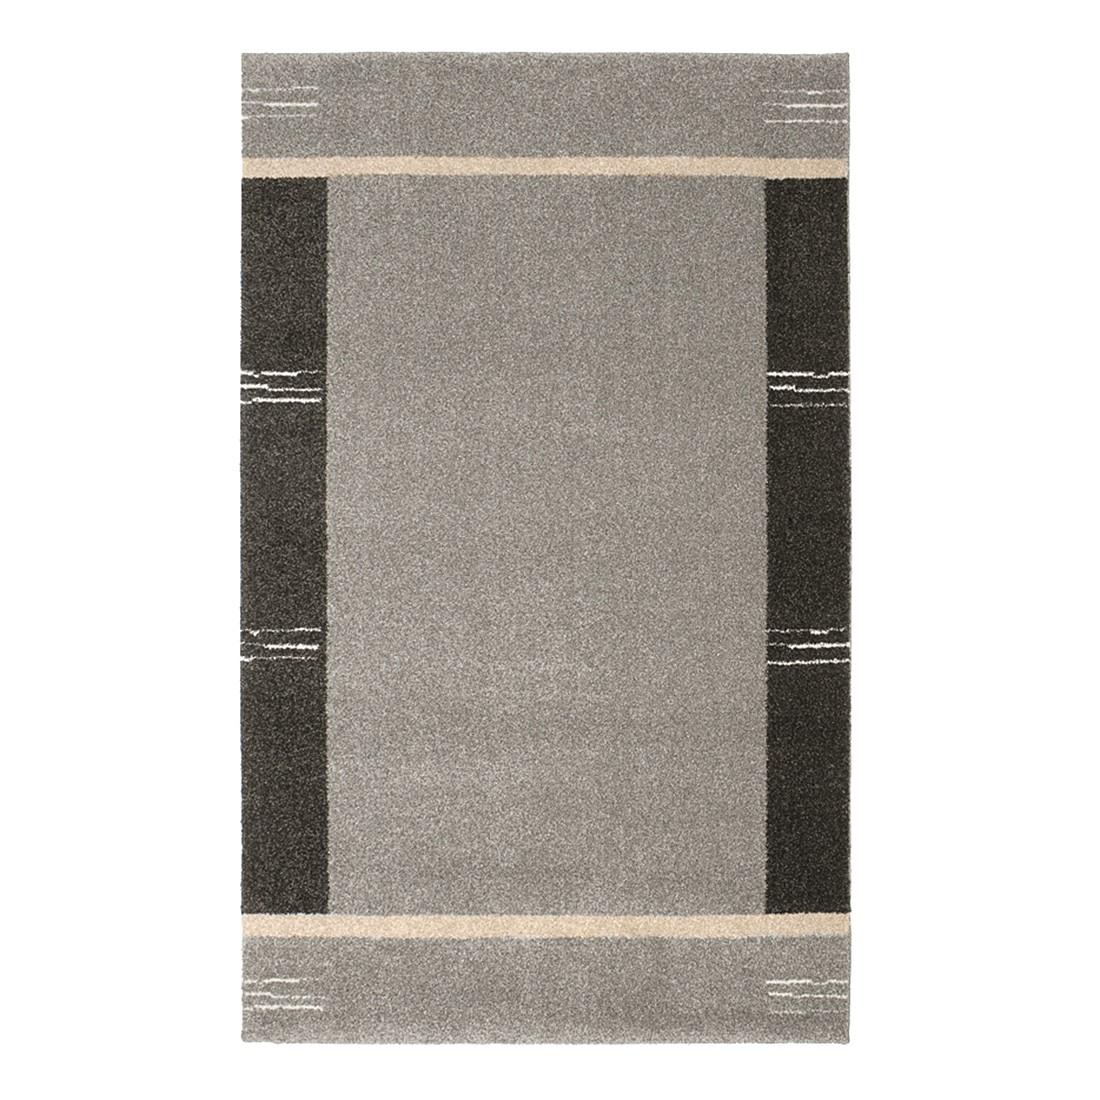 Teppich Samoa III – Grau – 240 x 300 cm, Astra günstig kaufen